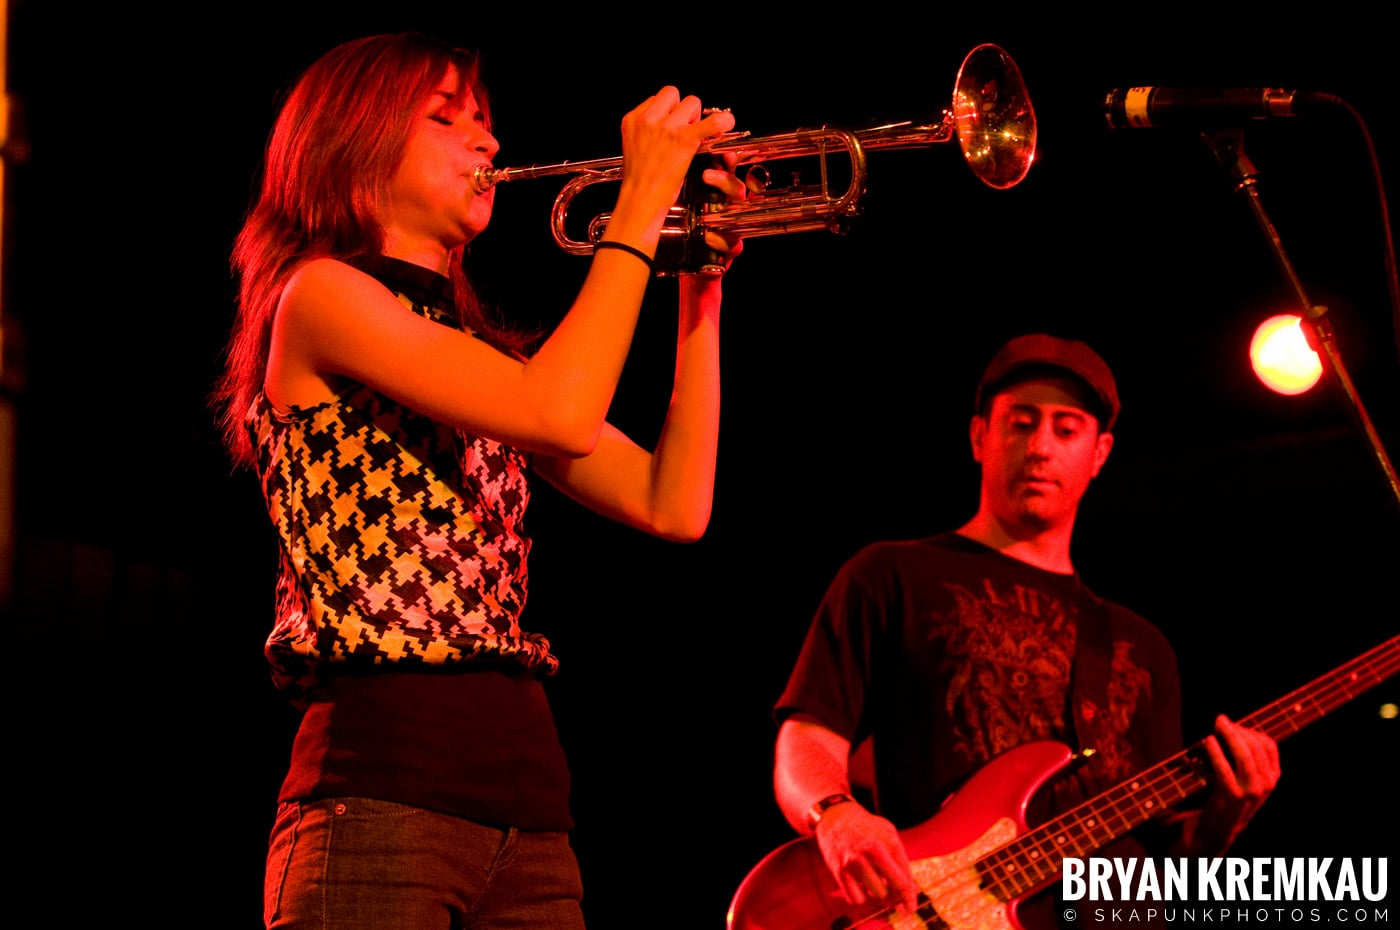 Avon Junkies (Ska is Dead Tour) @ Starland Ballroom, Sayreville, NJ - 11.15.09 (1)